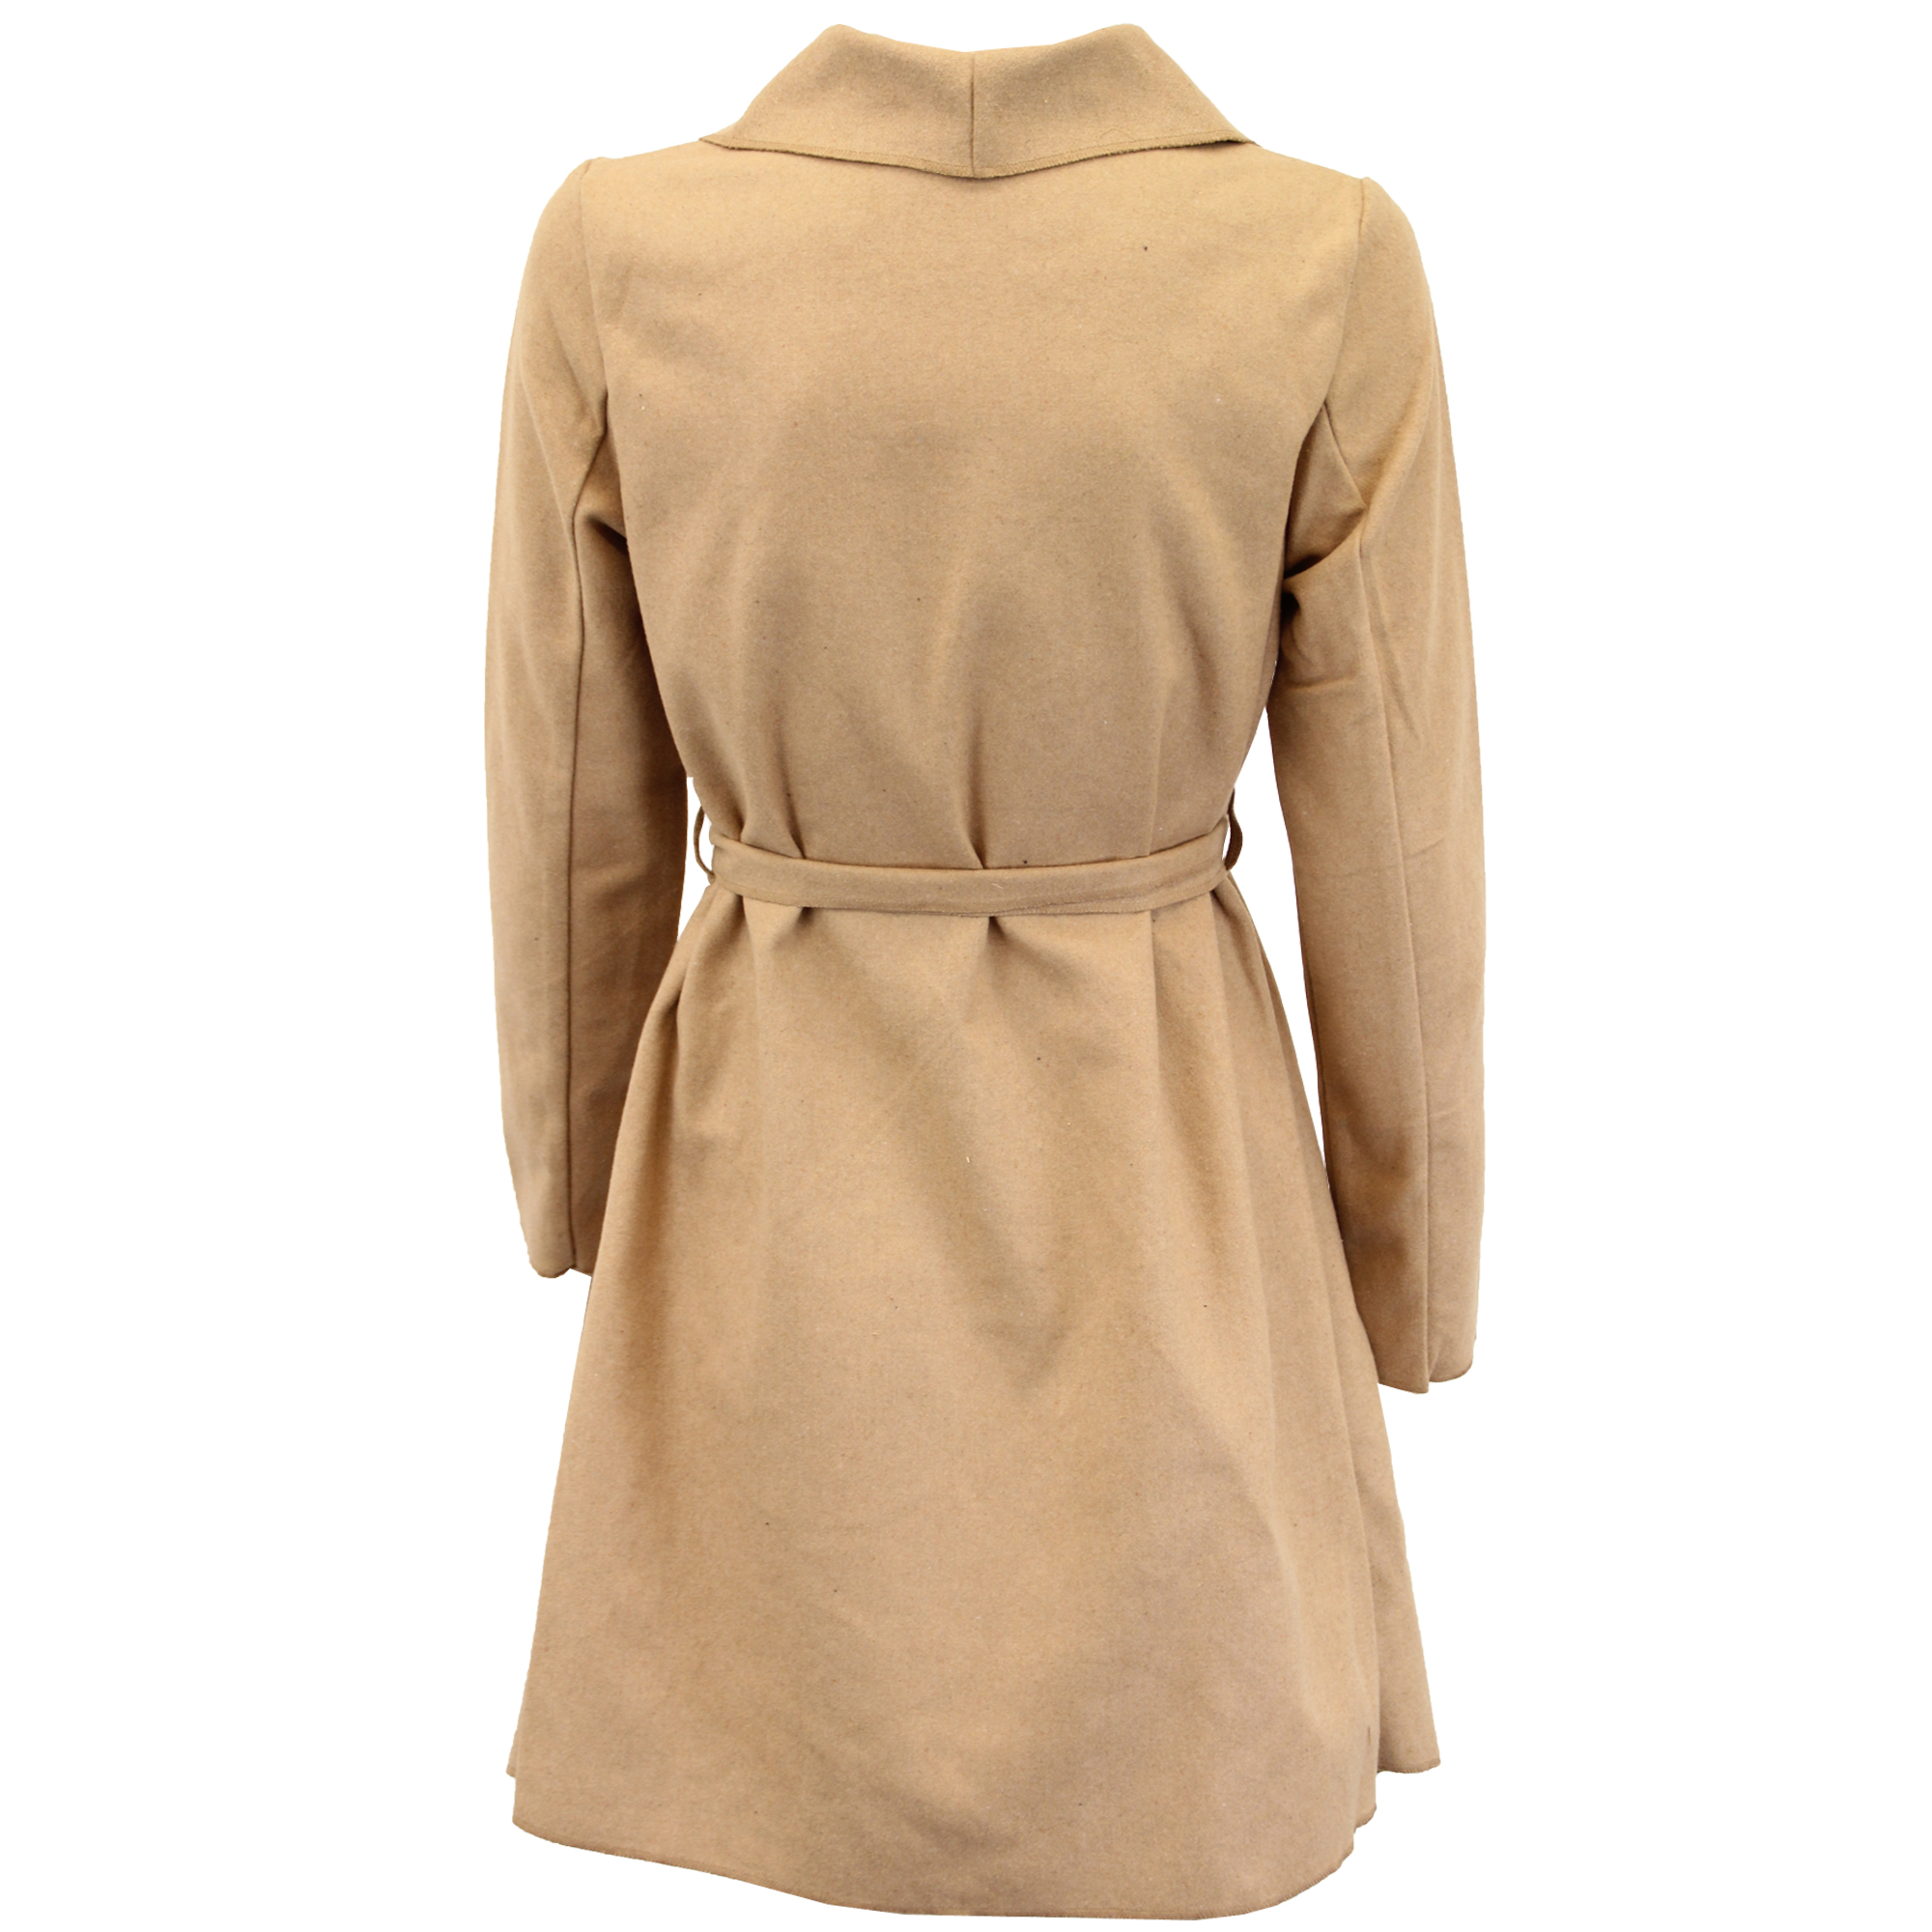 Ladies Jacket Brave Soul Womens Coat Wool Mix Open Front Belt Casual Winter New